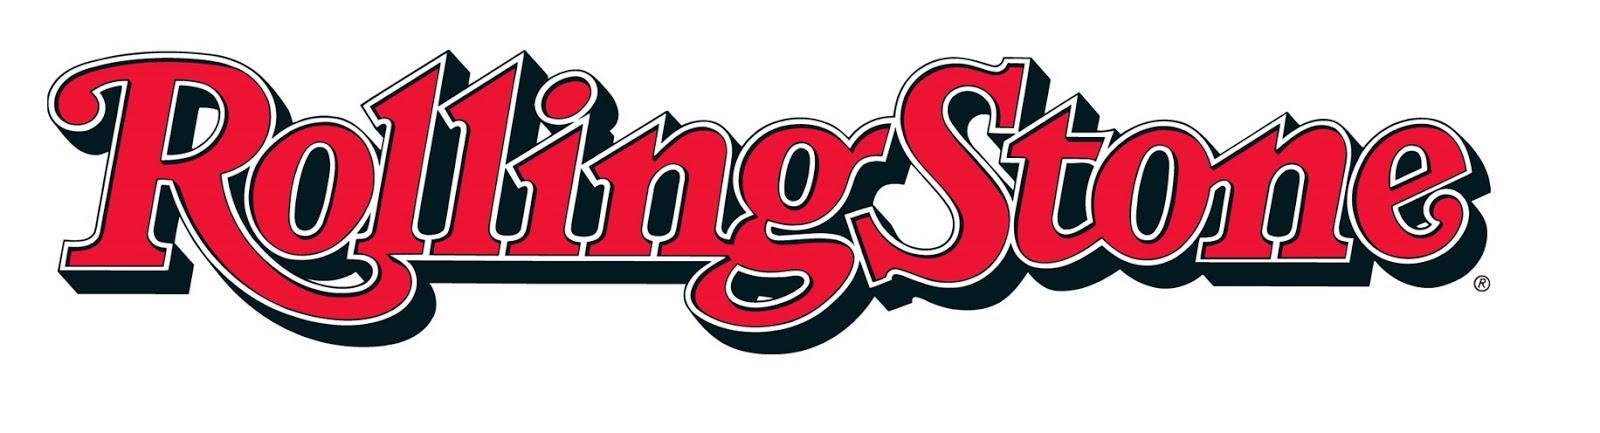 Rolling-Stone-LOGO-2.jpg